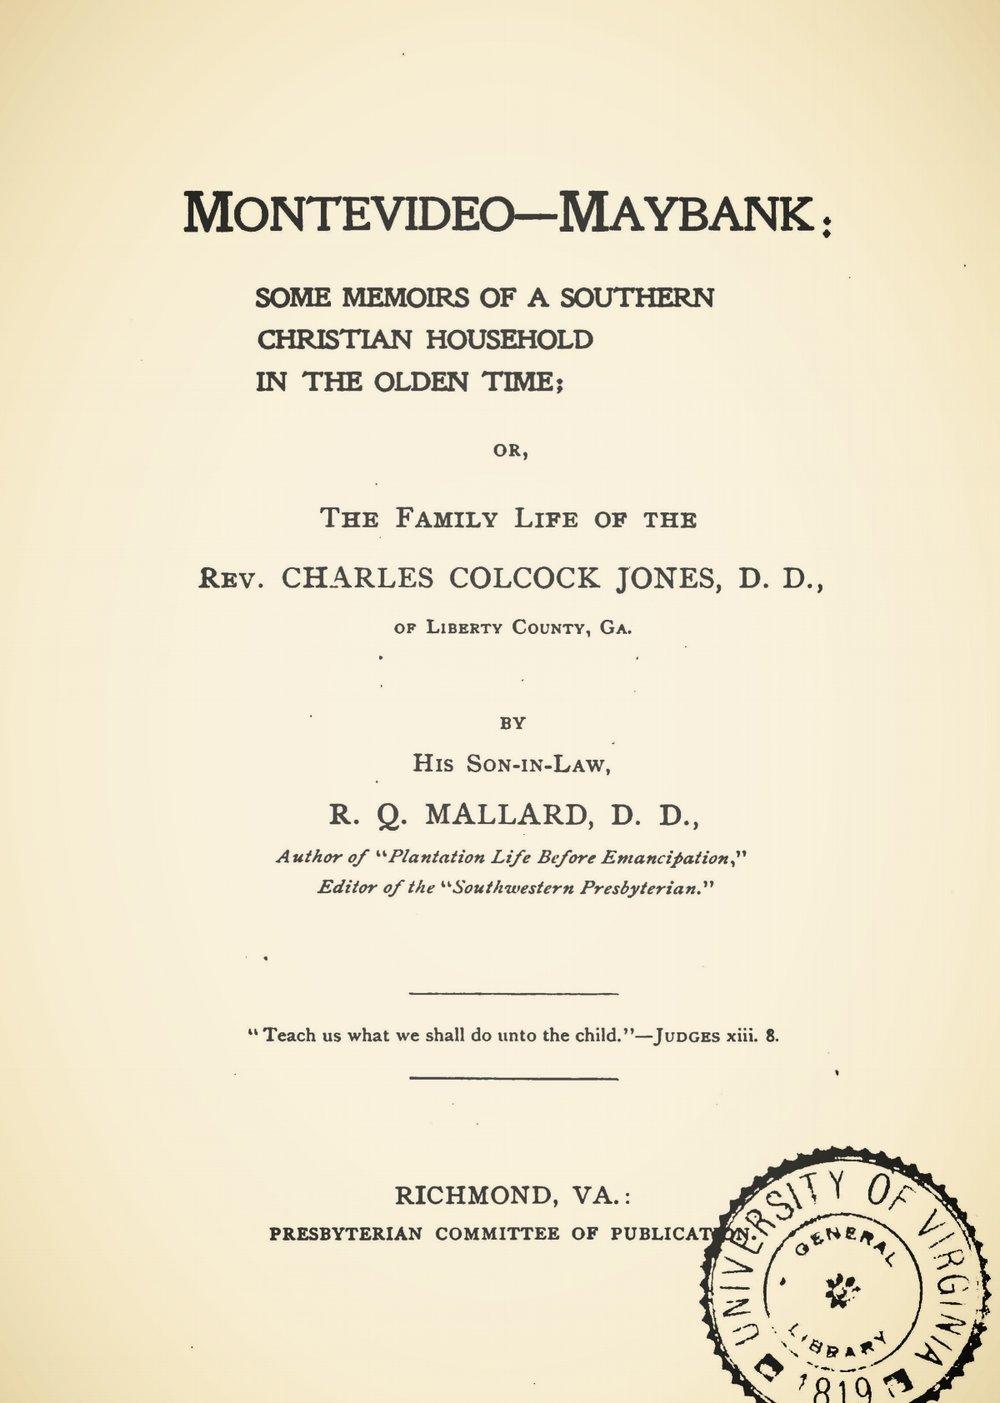 Mallard, Robert Quarterman, Montevideo-Maybank Title Page.jpg